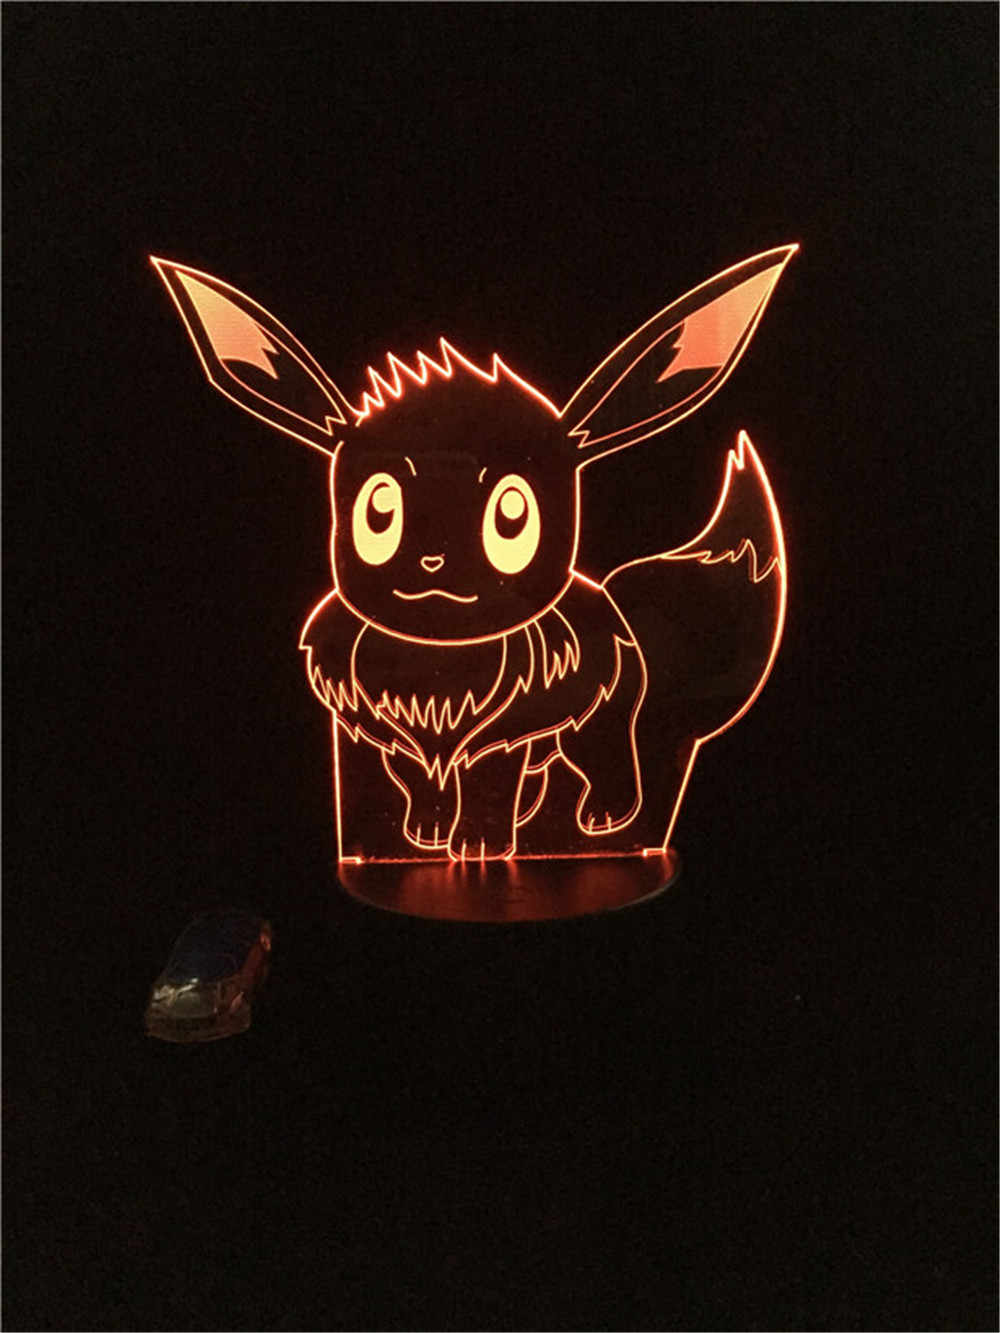 Christmas Eevee.Gaopin 3d Lamp Kawaii Cartoon Figure Pokemon Game Eevee Usb Led Night Light Illusion Lighting Christmas Gift Lava Home Deocr